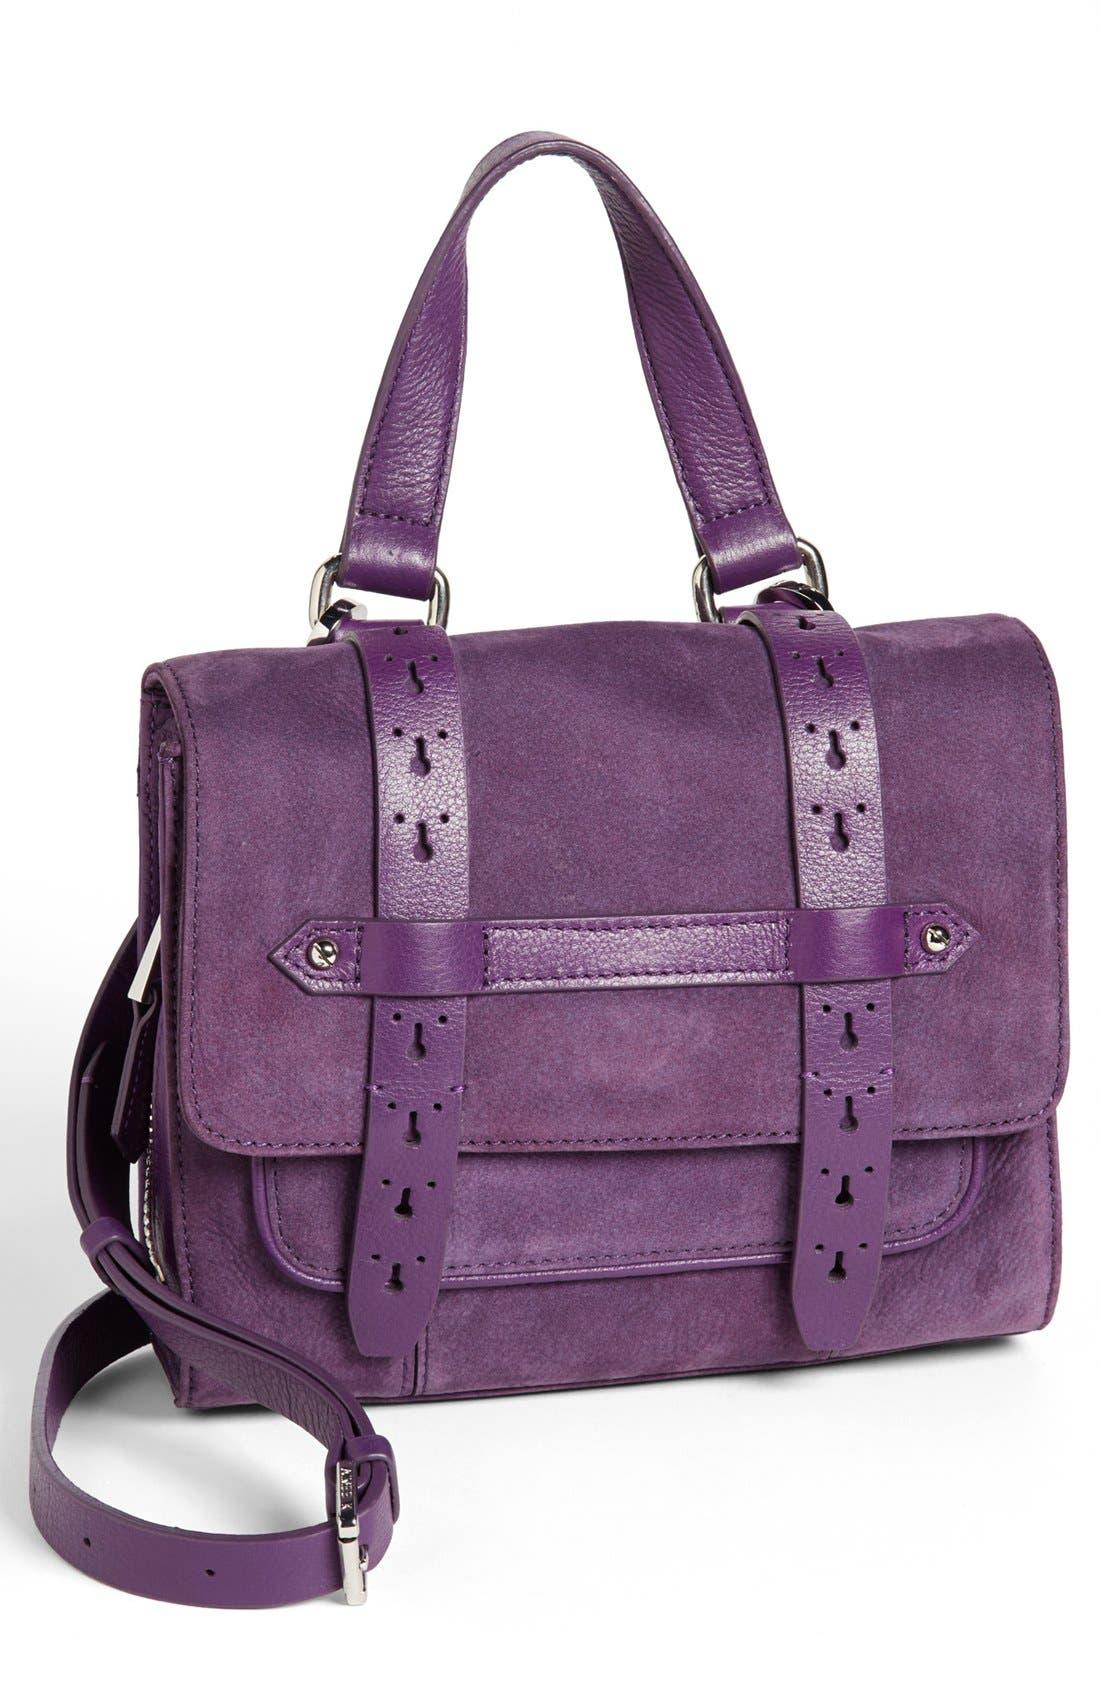 Alternate Image 1 Selected - Aimee Kestenberg 'Sammy' Crossbody Bag, Small